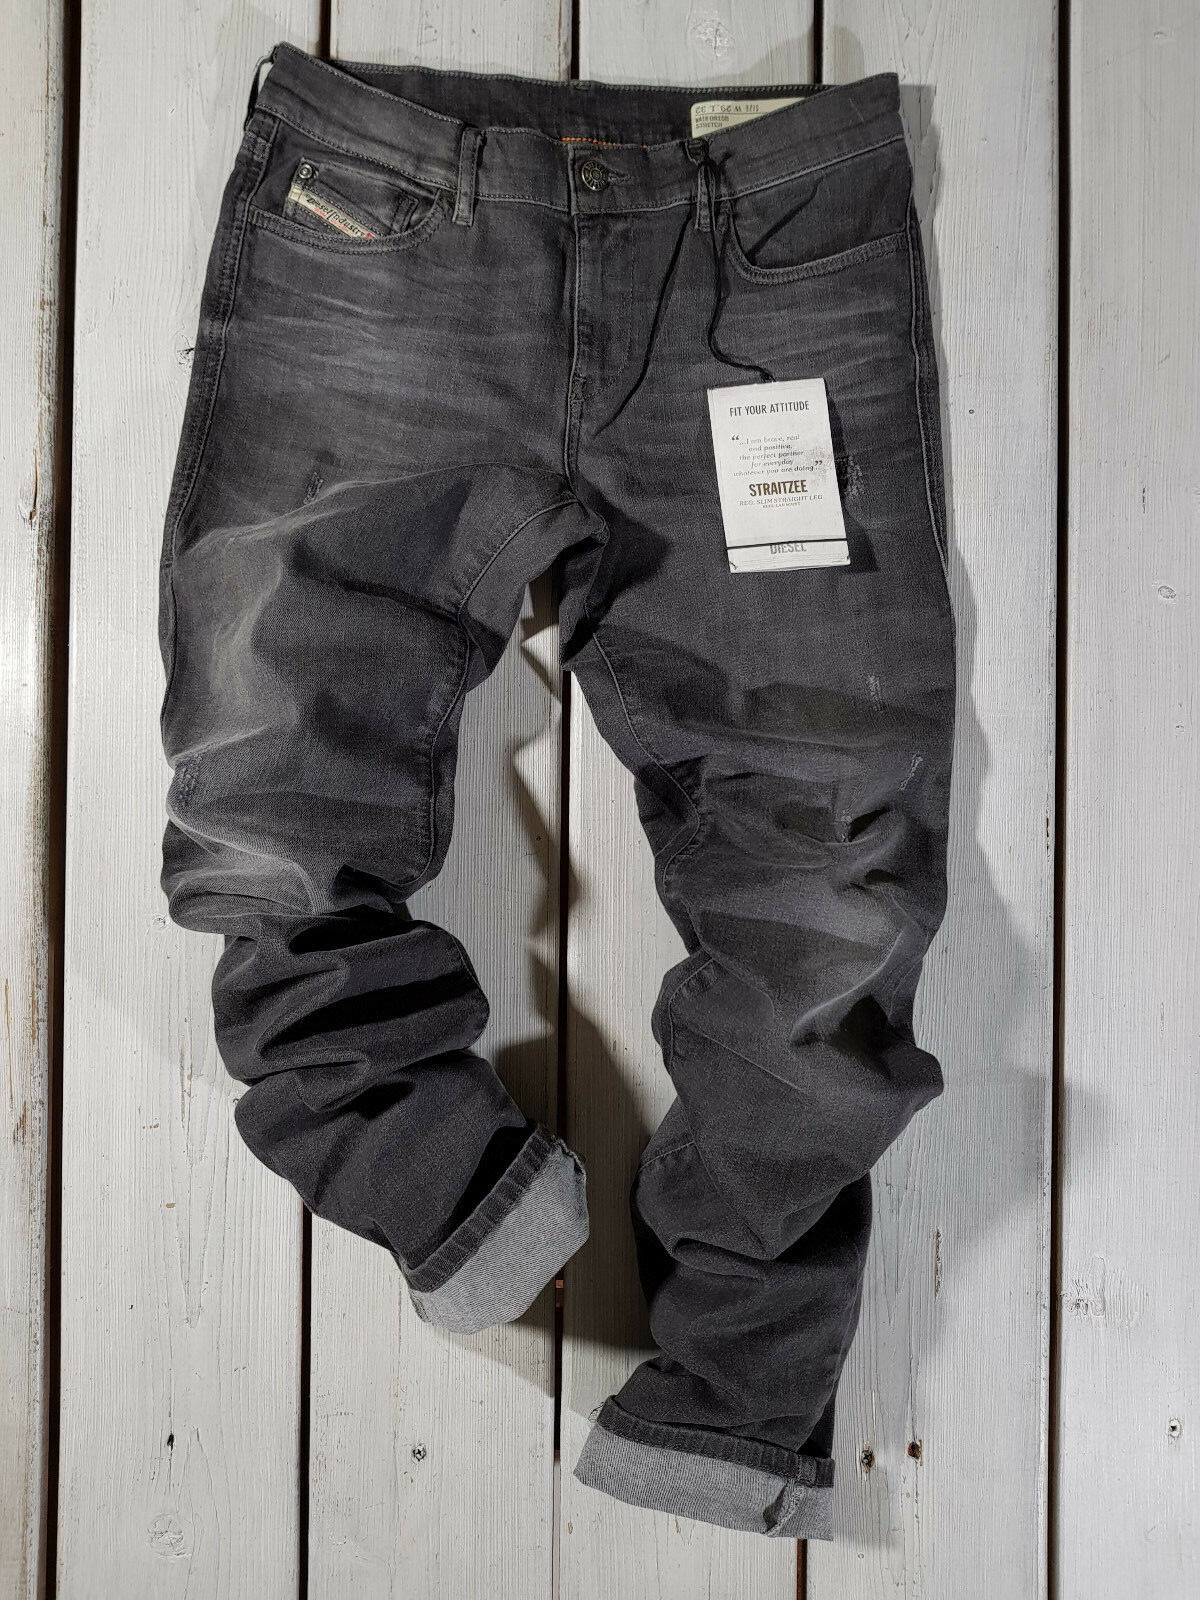 Neu Diesel DAMEN Jeans Straitzee 0815b Normale Passform Gerade Regular